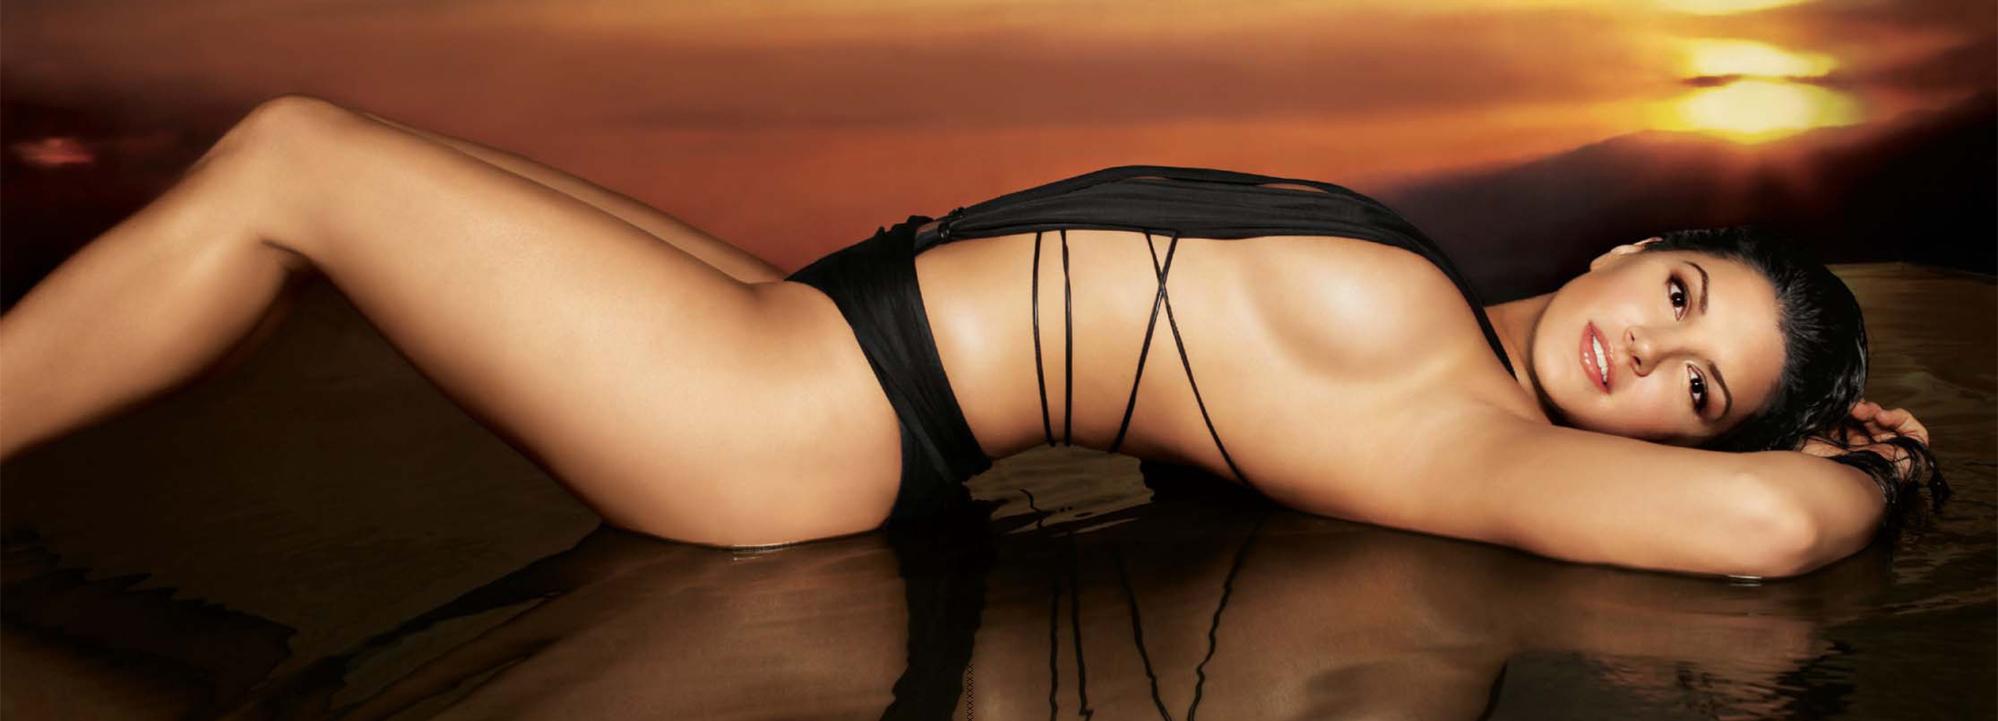 Gina Carano Nude Sexy